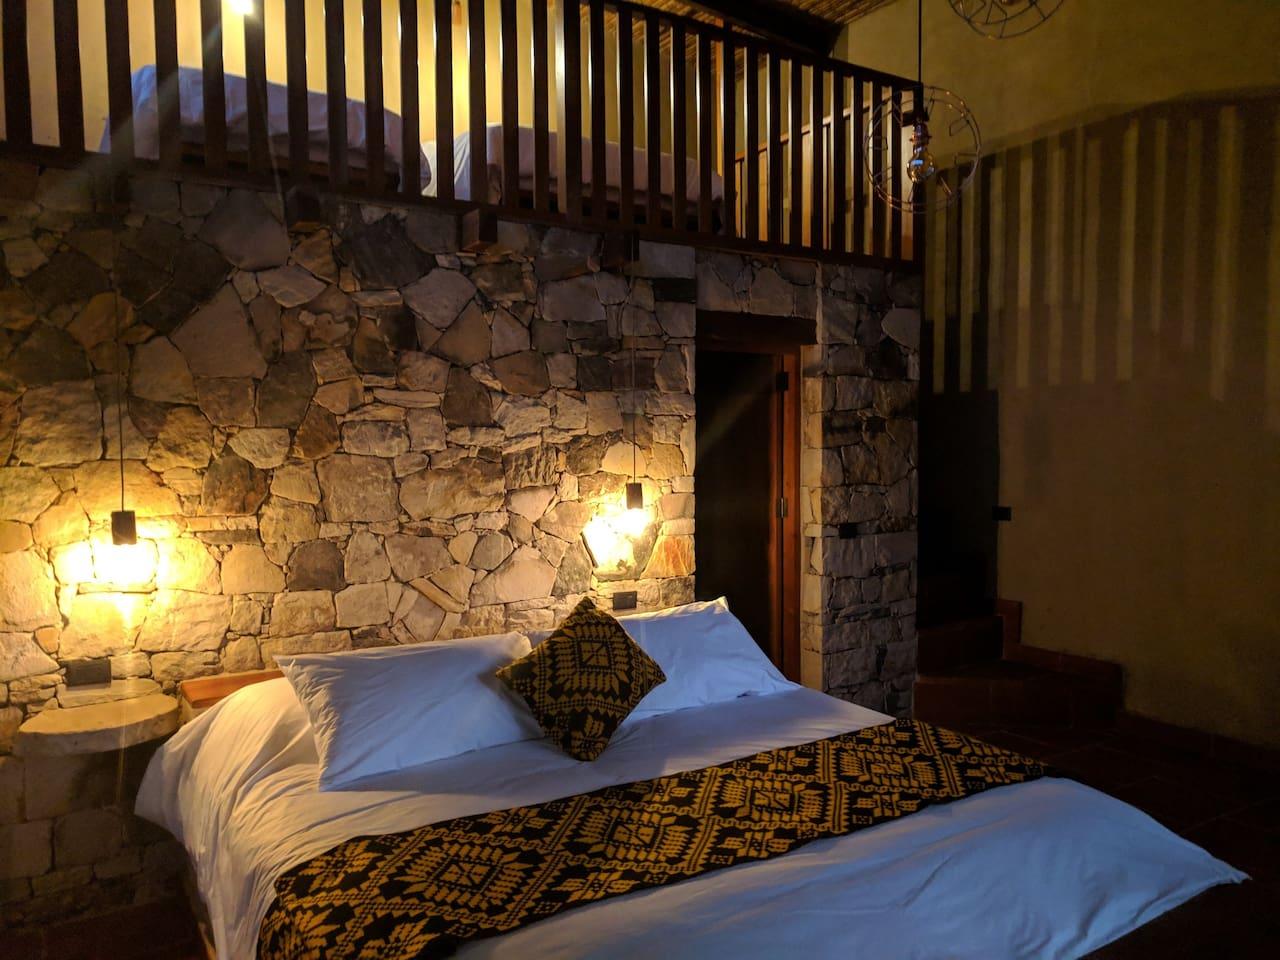 Cama King size con vista a la catarata de Gocta / King size bed with view at Gocta Waterfall